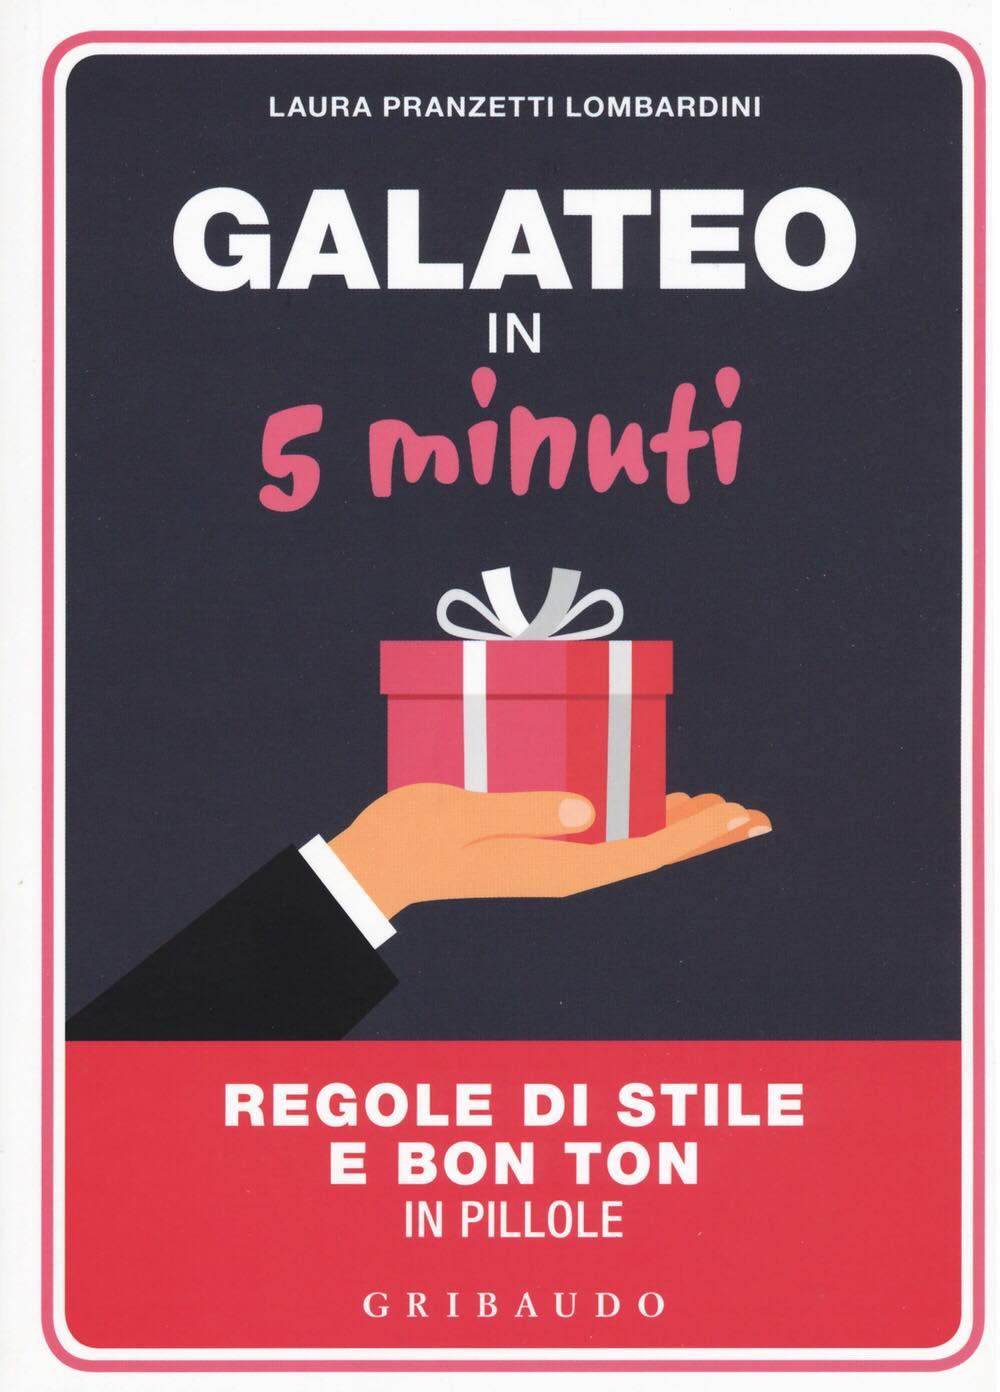 Recensione di Galateo In 5 Minuti – Laura Pranzetti Lombardini